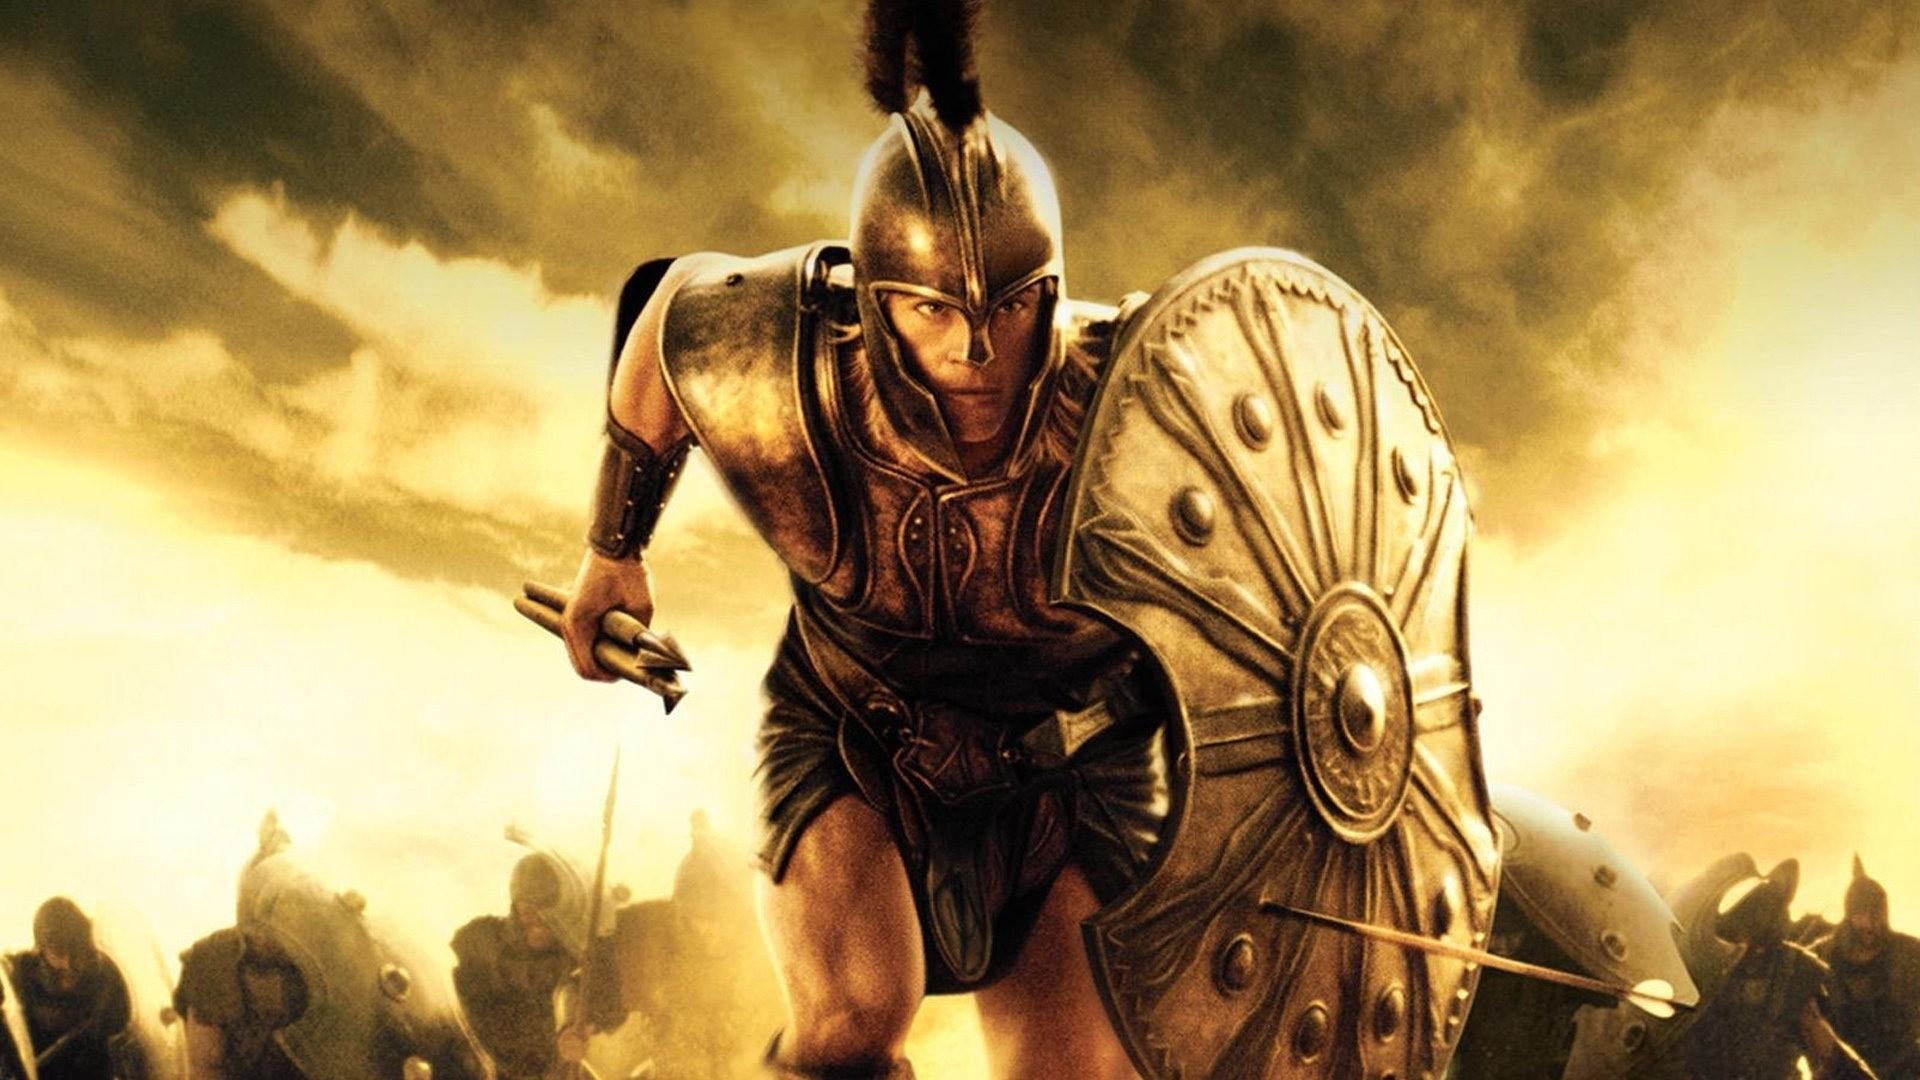 Armor Of God Wallpaper (63+ Images